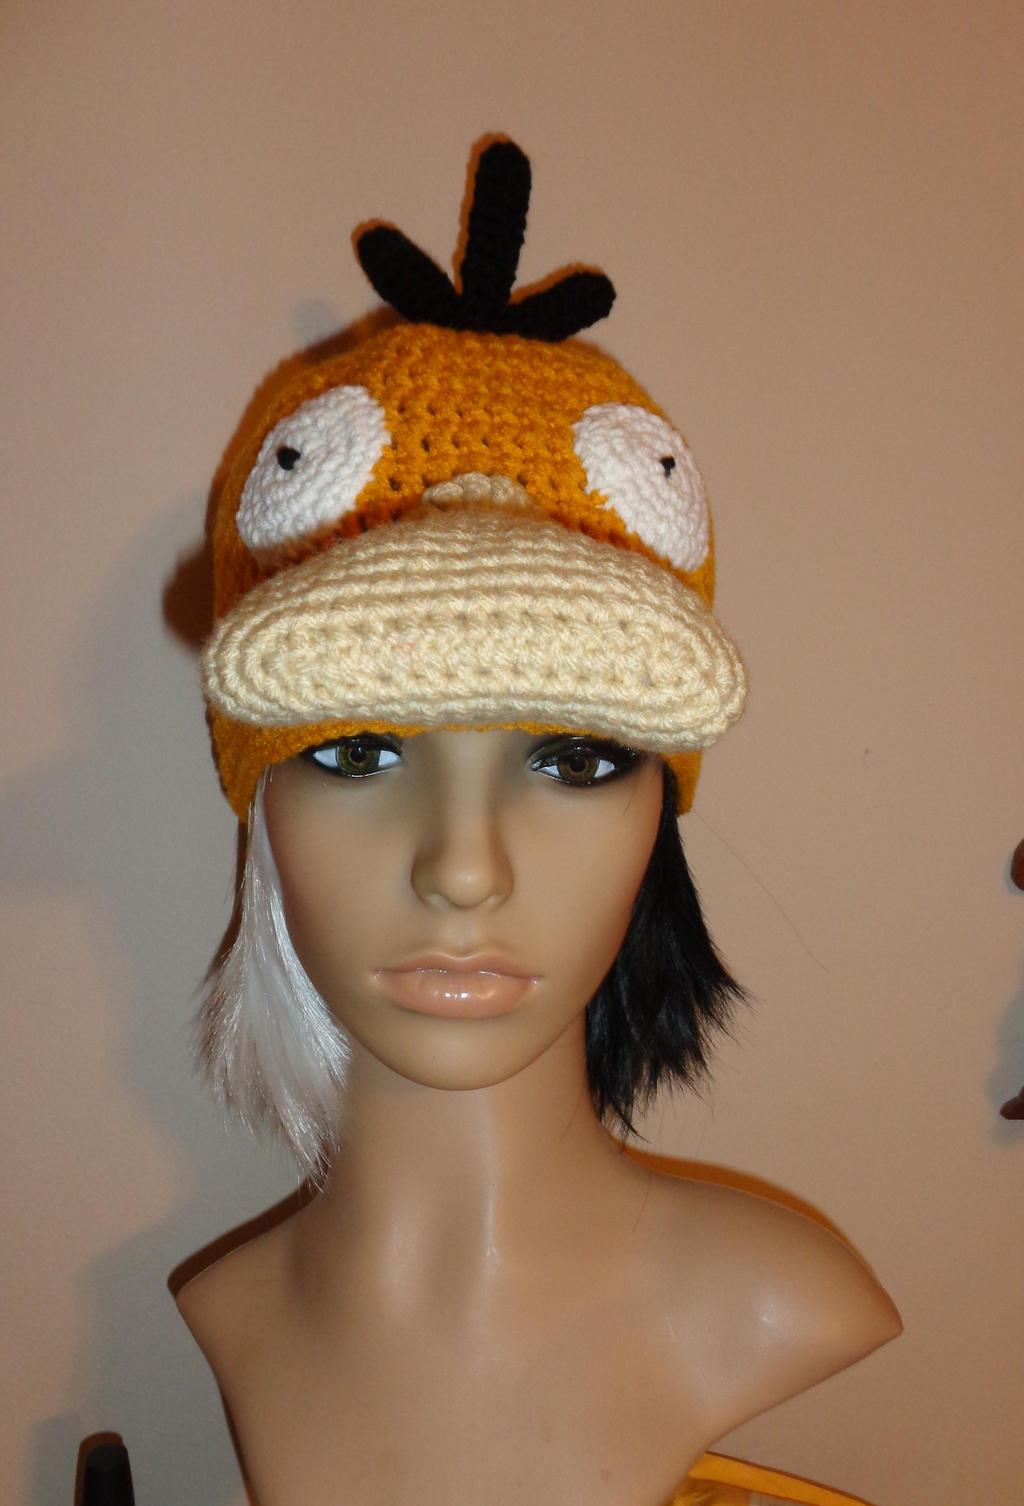 Crochet Baby Hats Pikachu Hat, Pokemon, Crochet Baby Hat, Baby Hat ... | 1506x1024